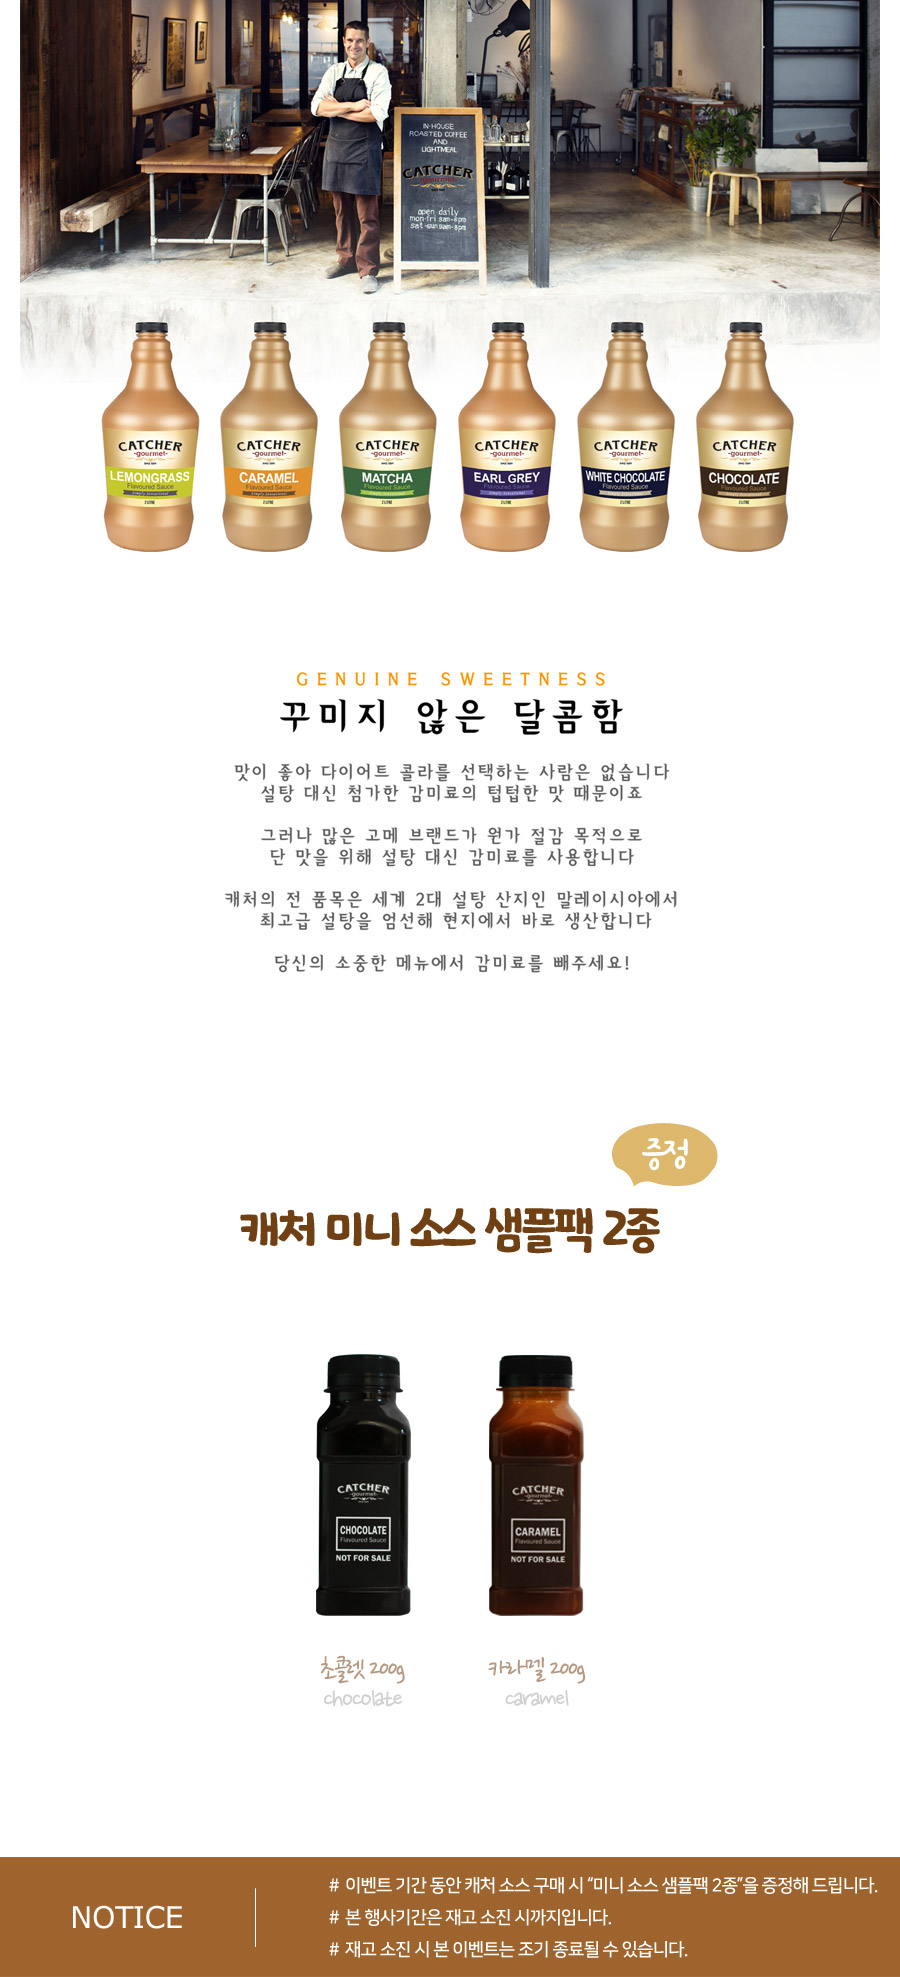 SauceSample_gift_900